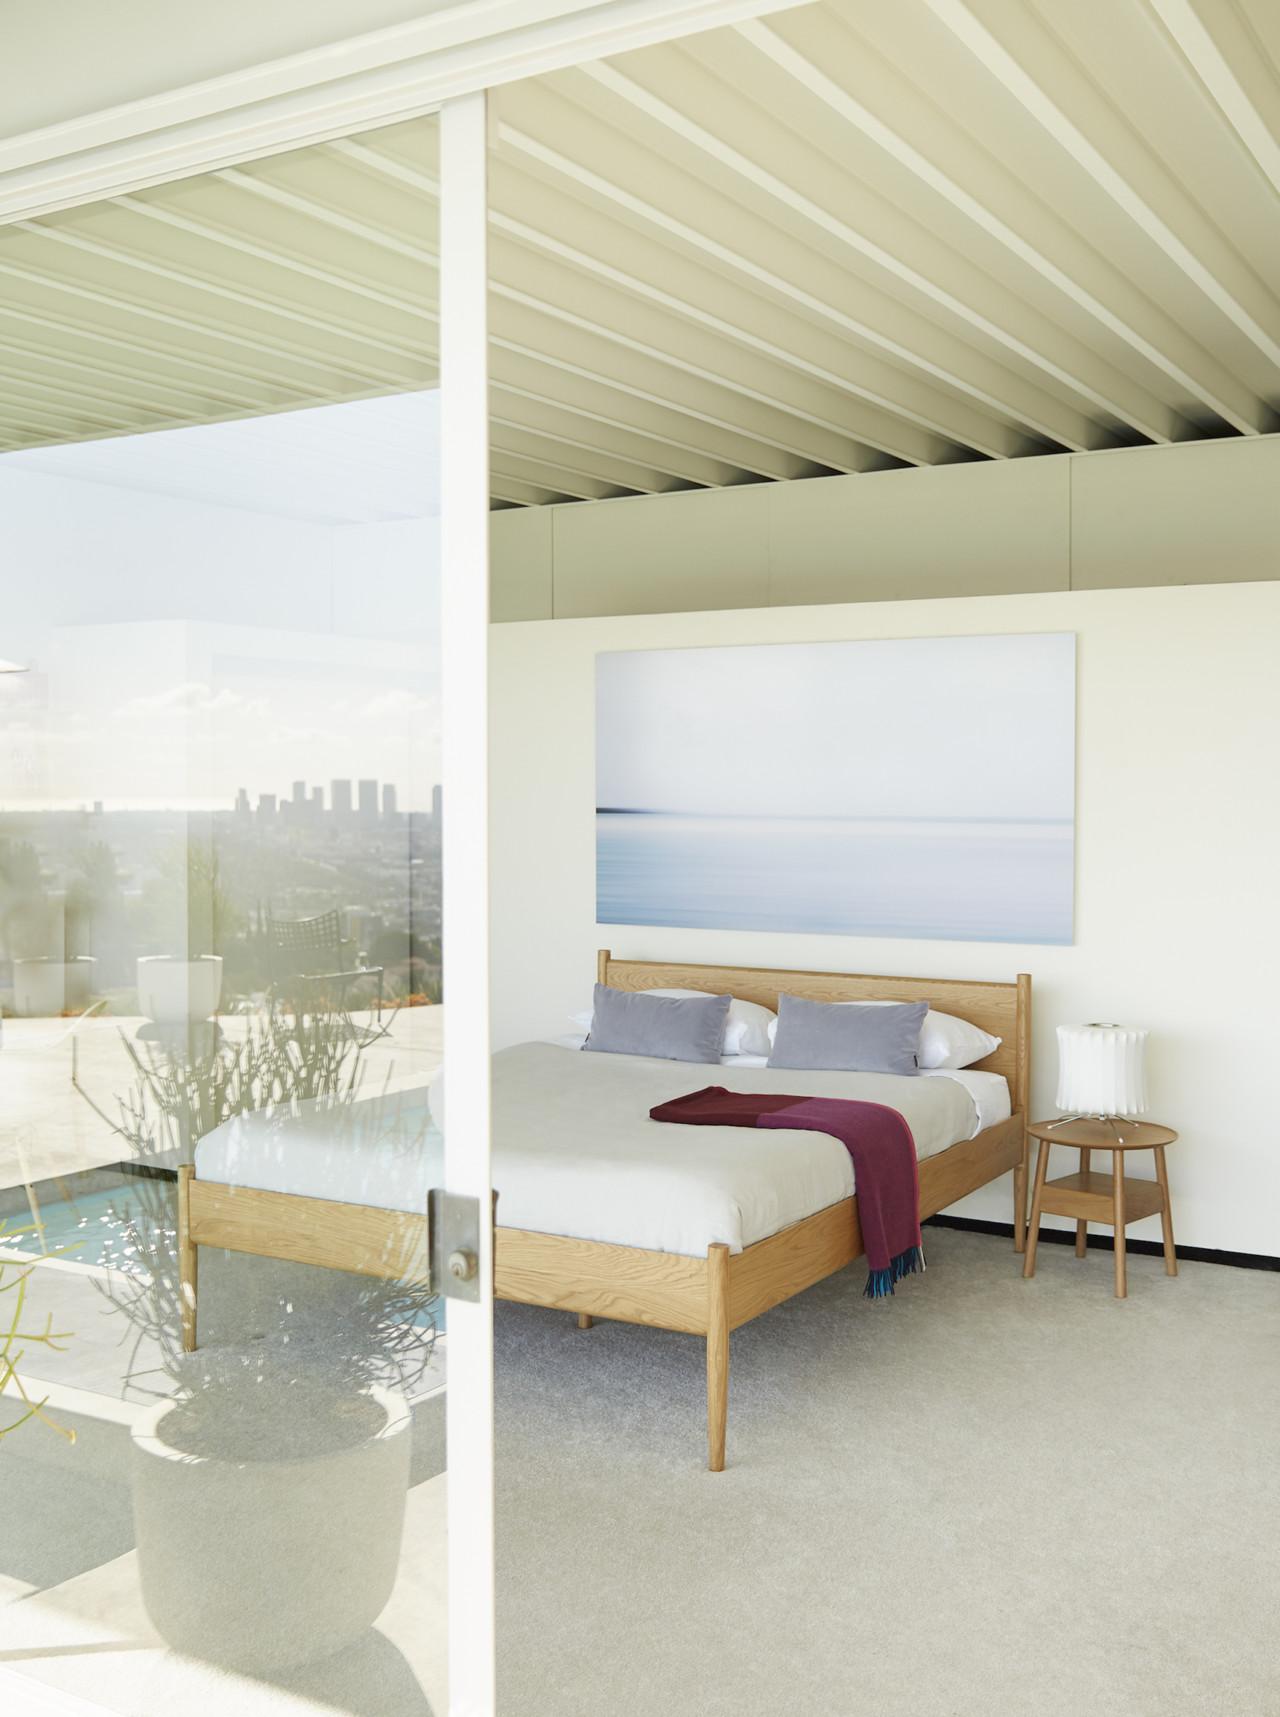 design-within-reach-stahl-house-7.jpg